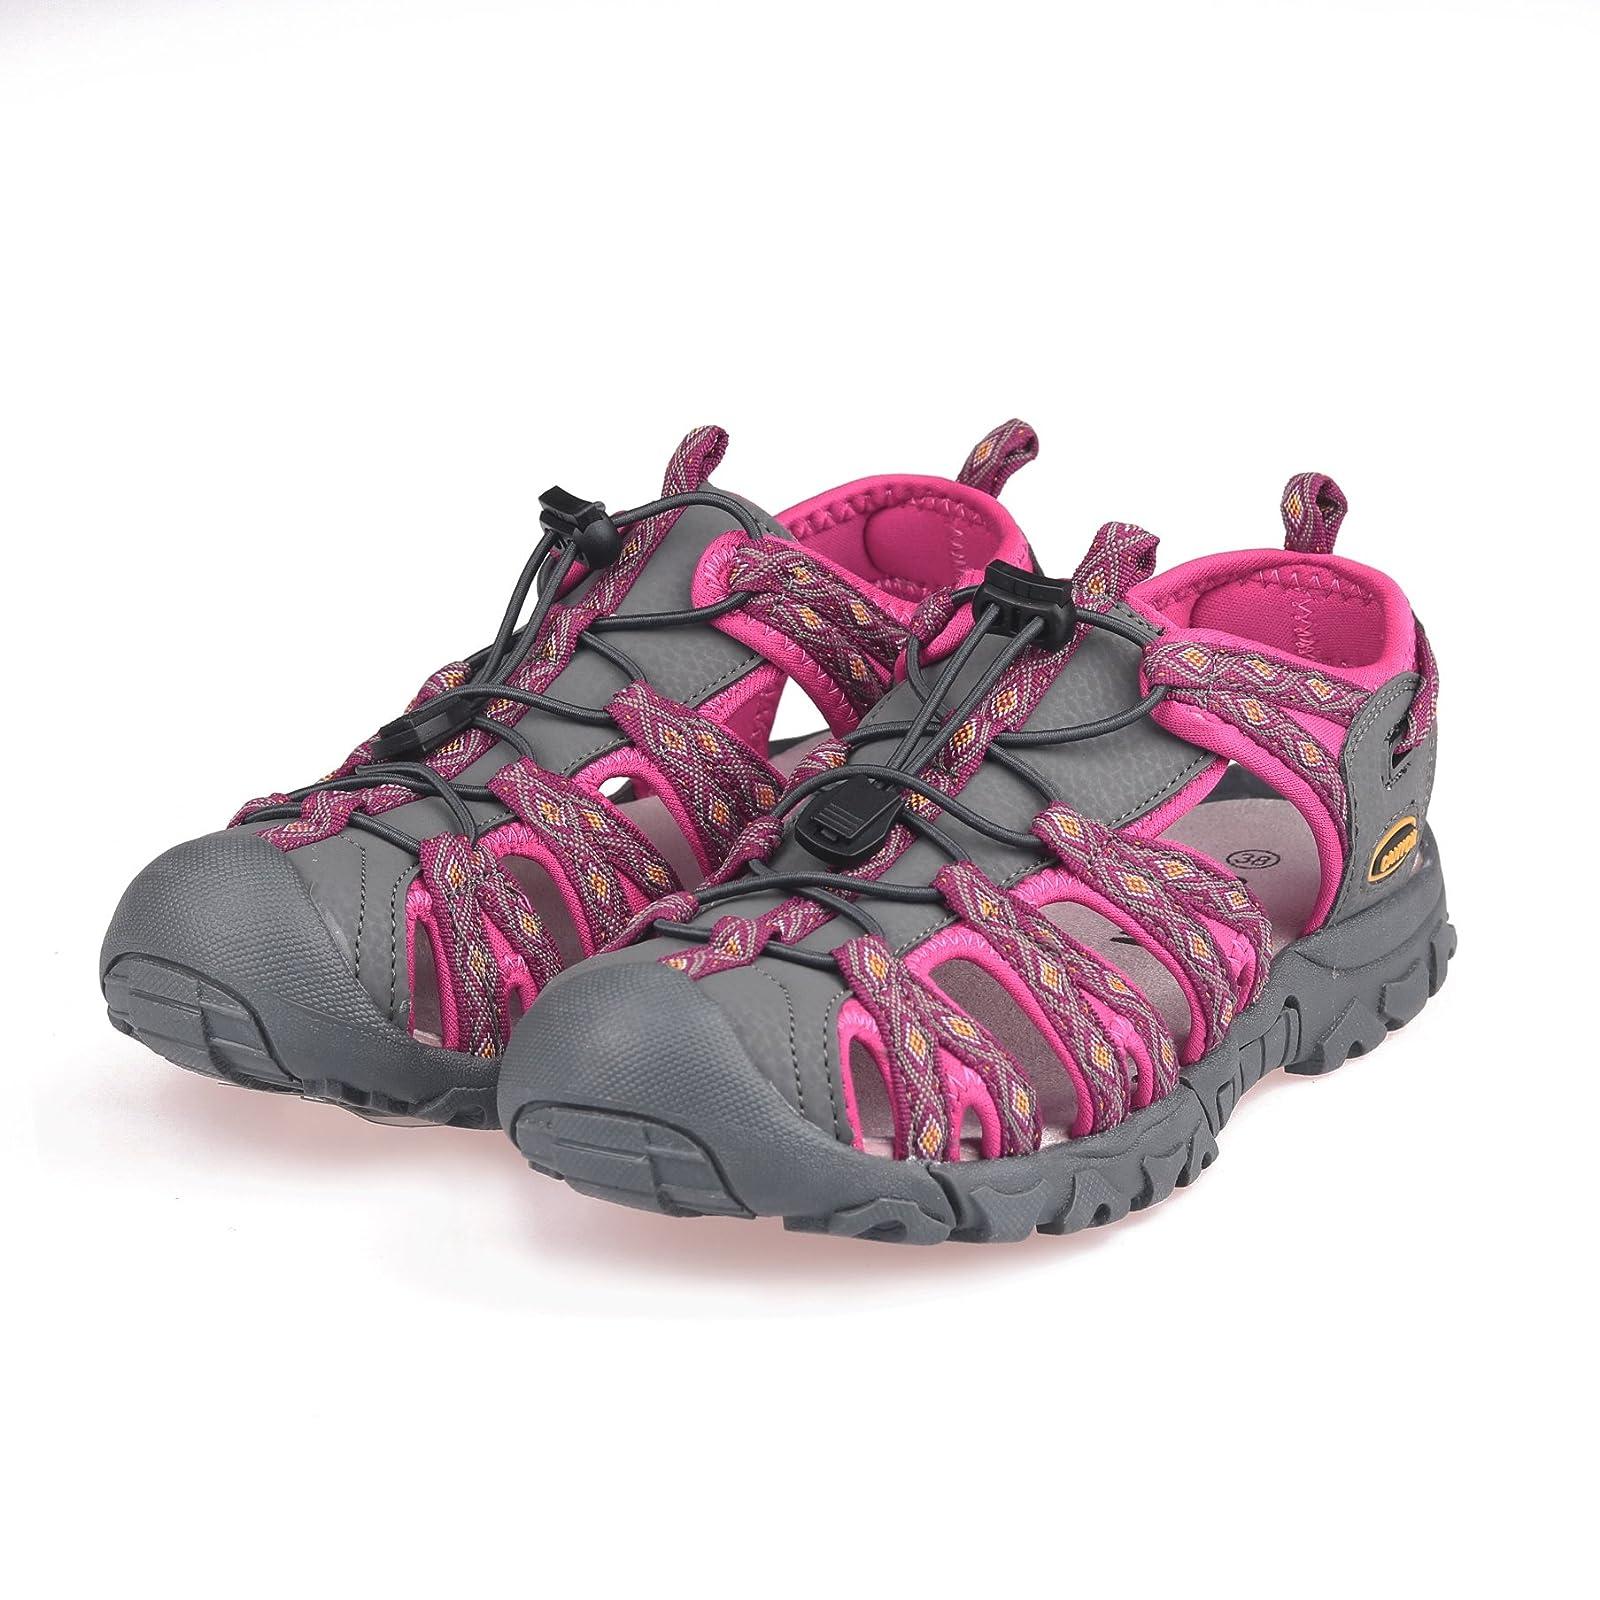 GRITION Women Outdoor Summer Sandals Adjustable Closed - 7